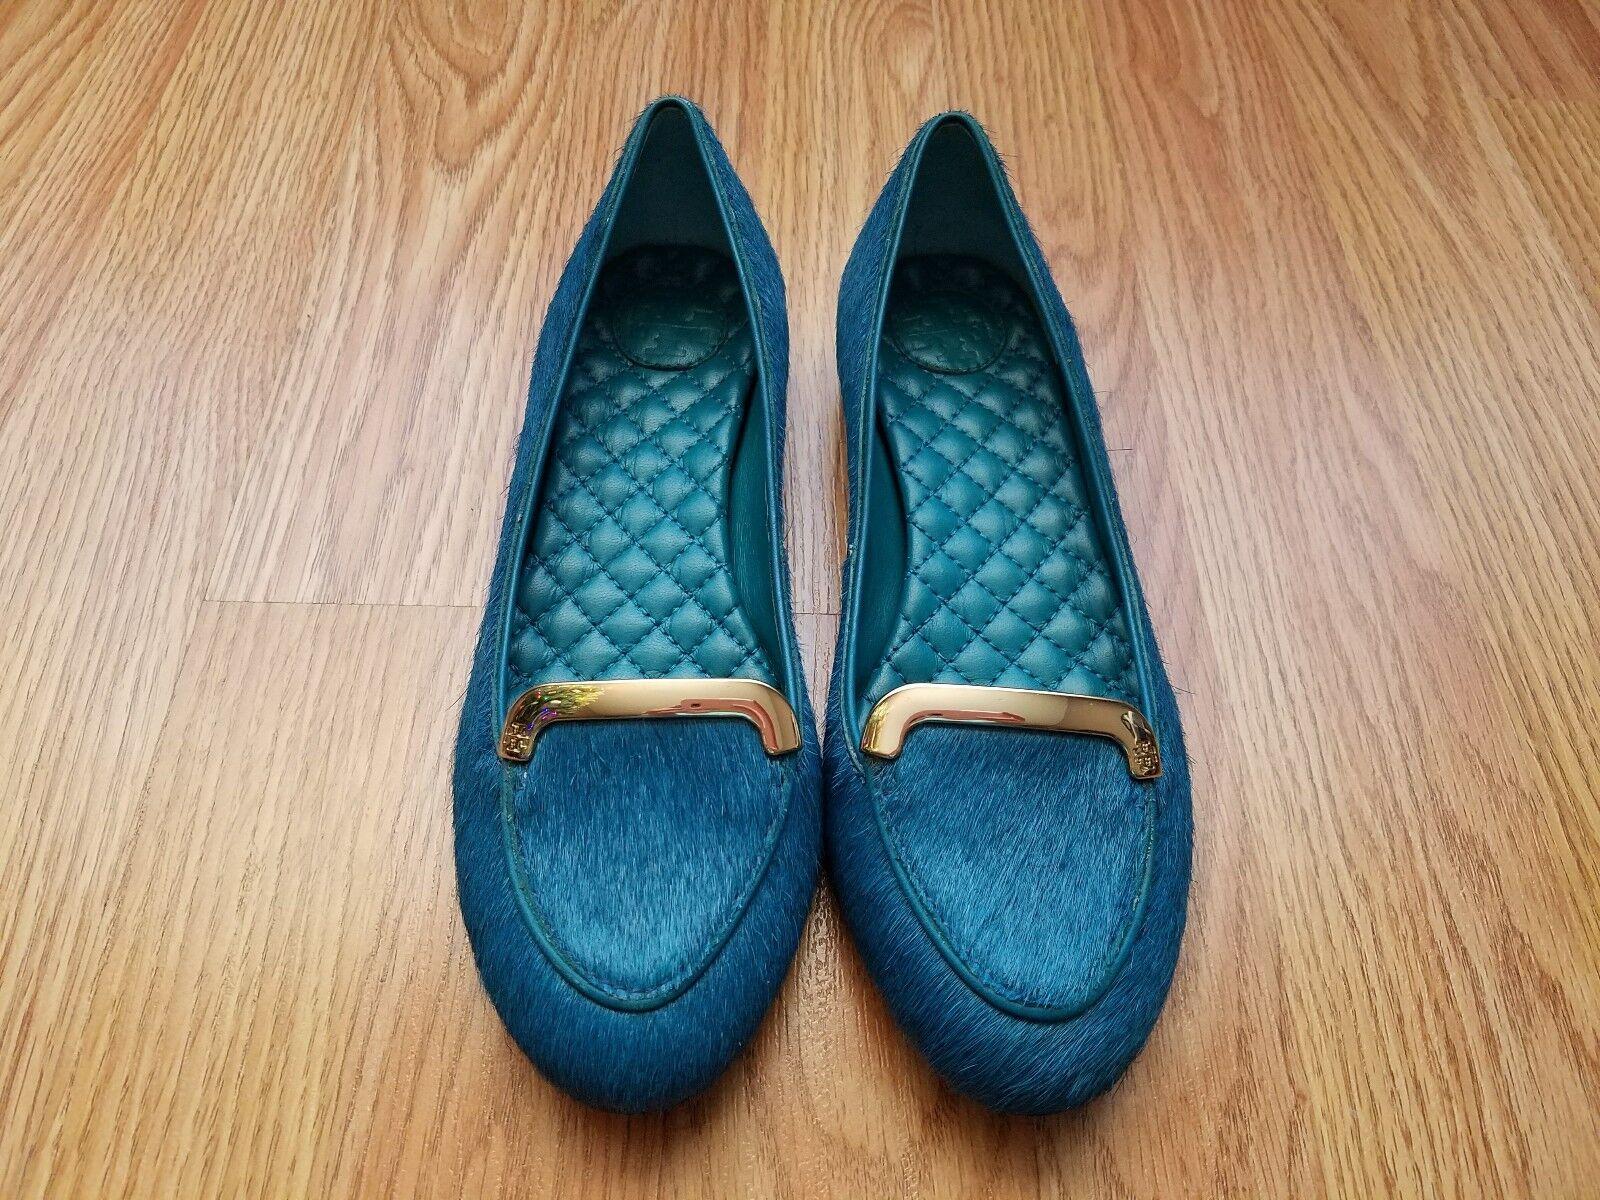 Tory Tory Tory Burch Jess Electric bluee Calf Hair Flats - bluee - Size 5 9ceb50